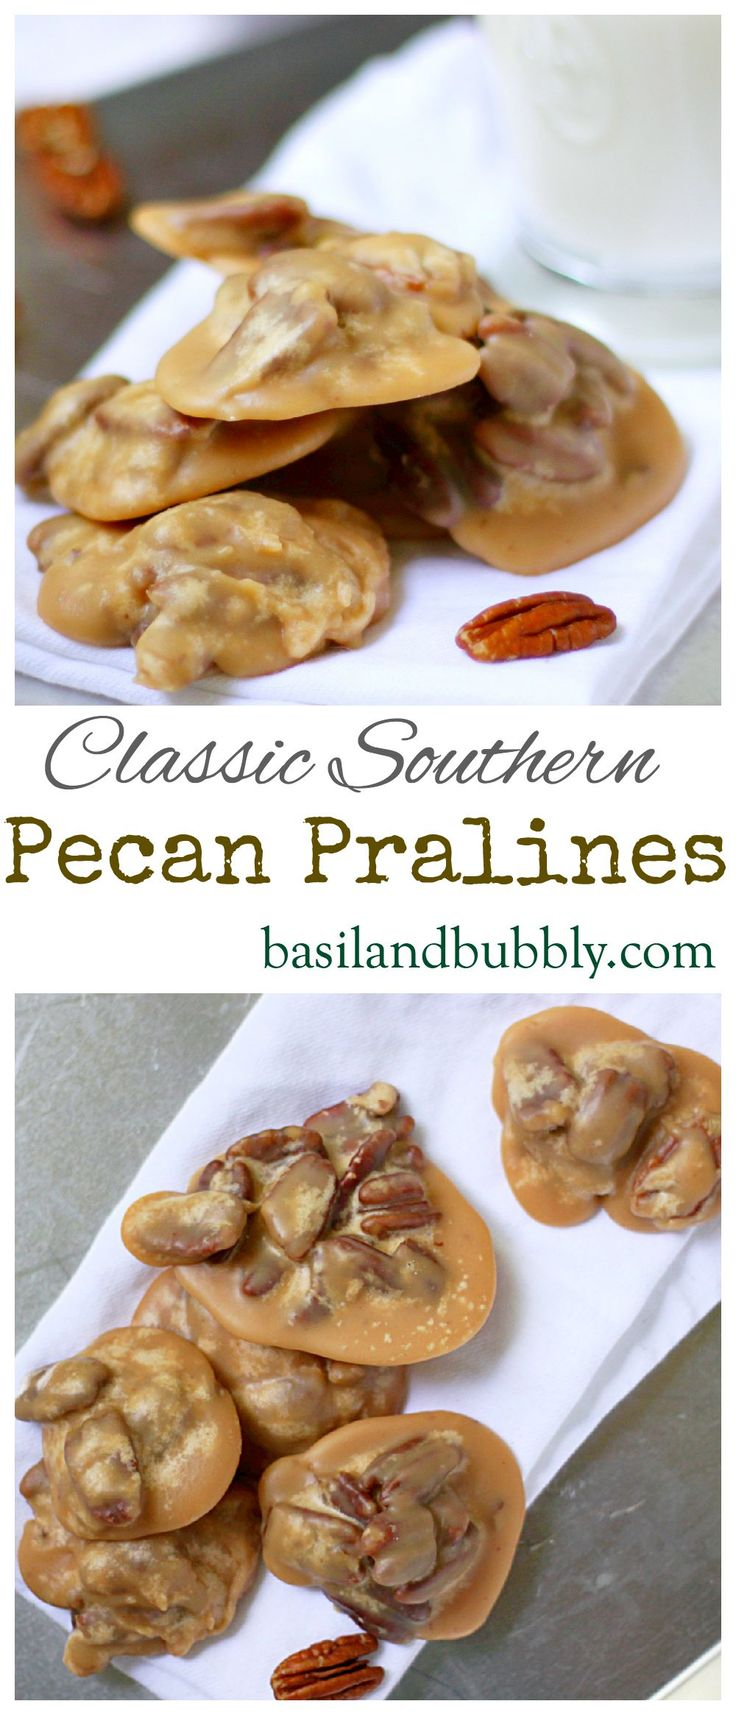 Classic Southern Pecan Pralines Copycat Recipe